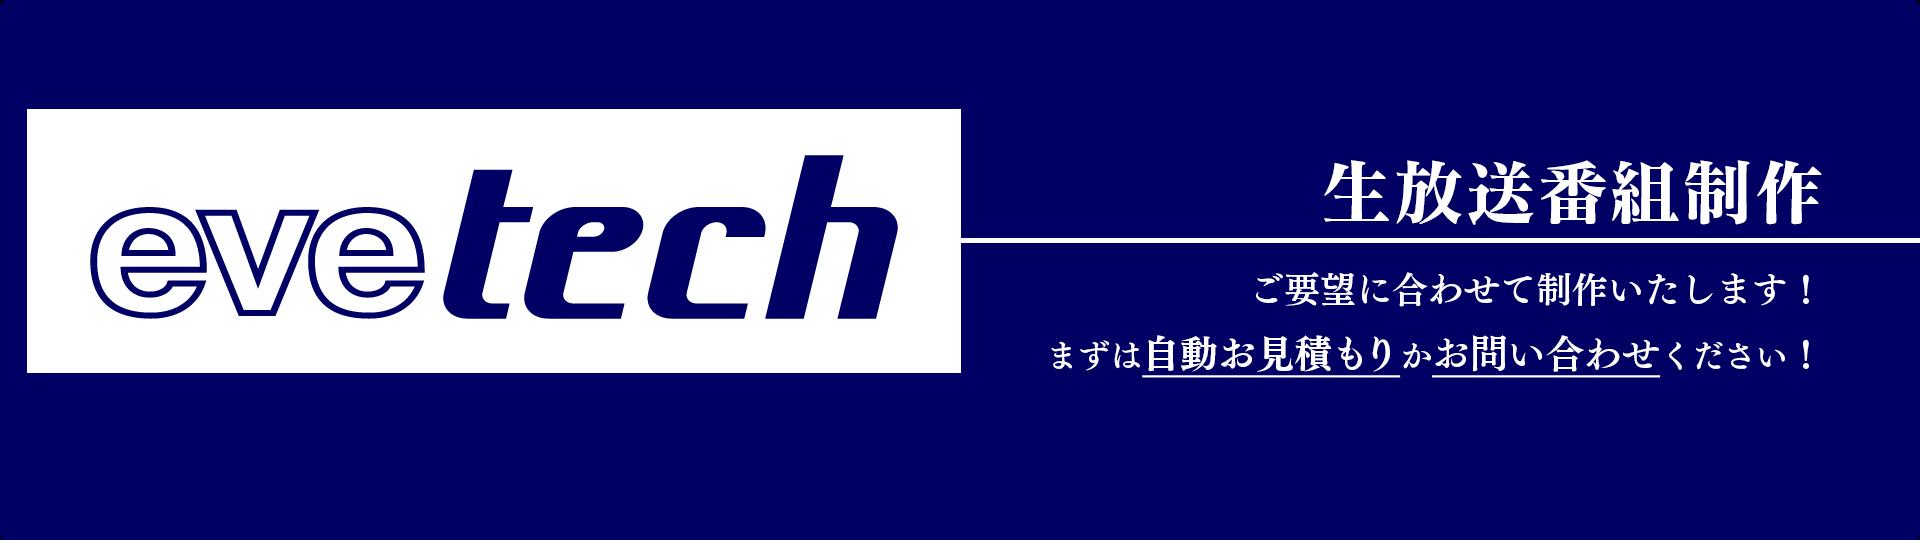 evetech_live _header